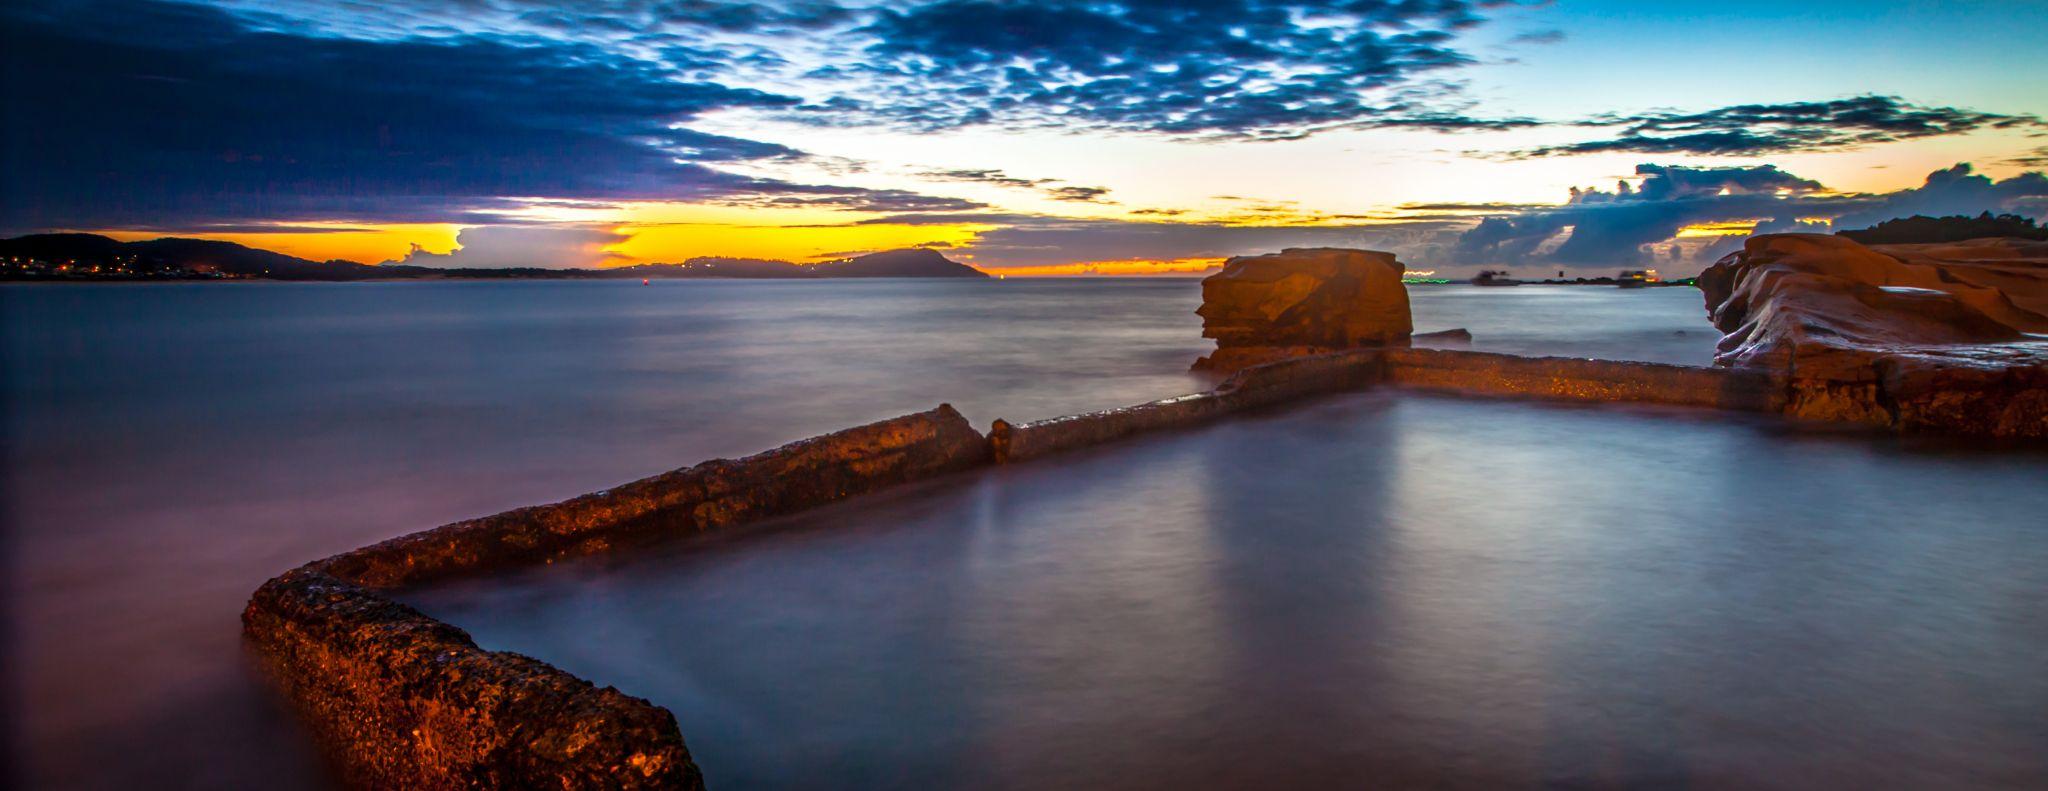 Pool sunrise Terrigal, Central Coast, New South Wales, Australia